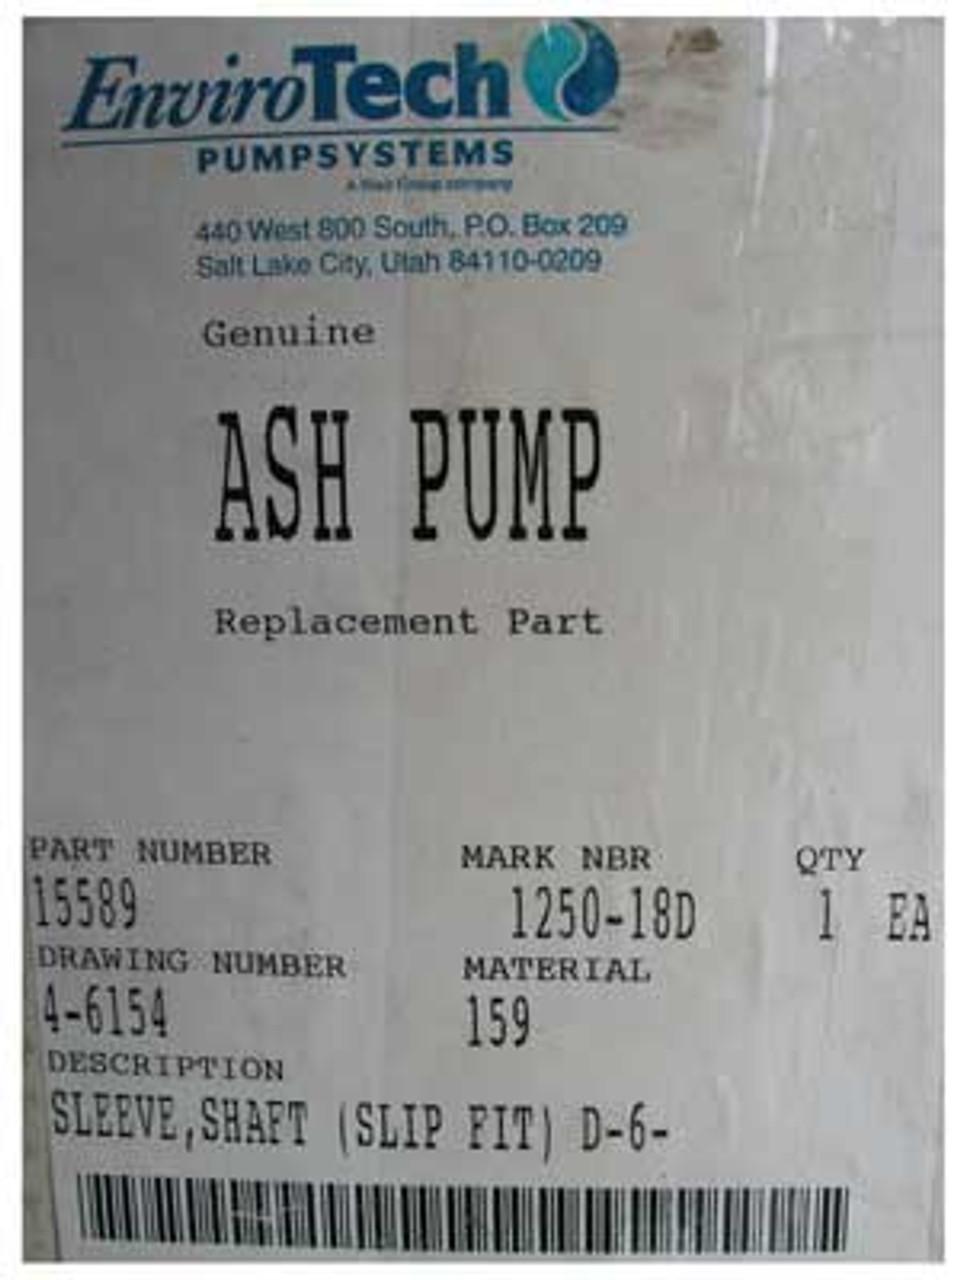 EnviroTech #15589 Genuine Ash Pump Replacement Part